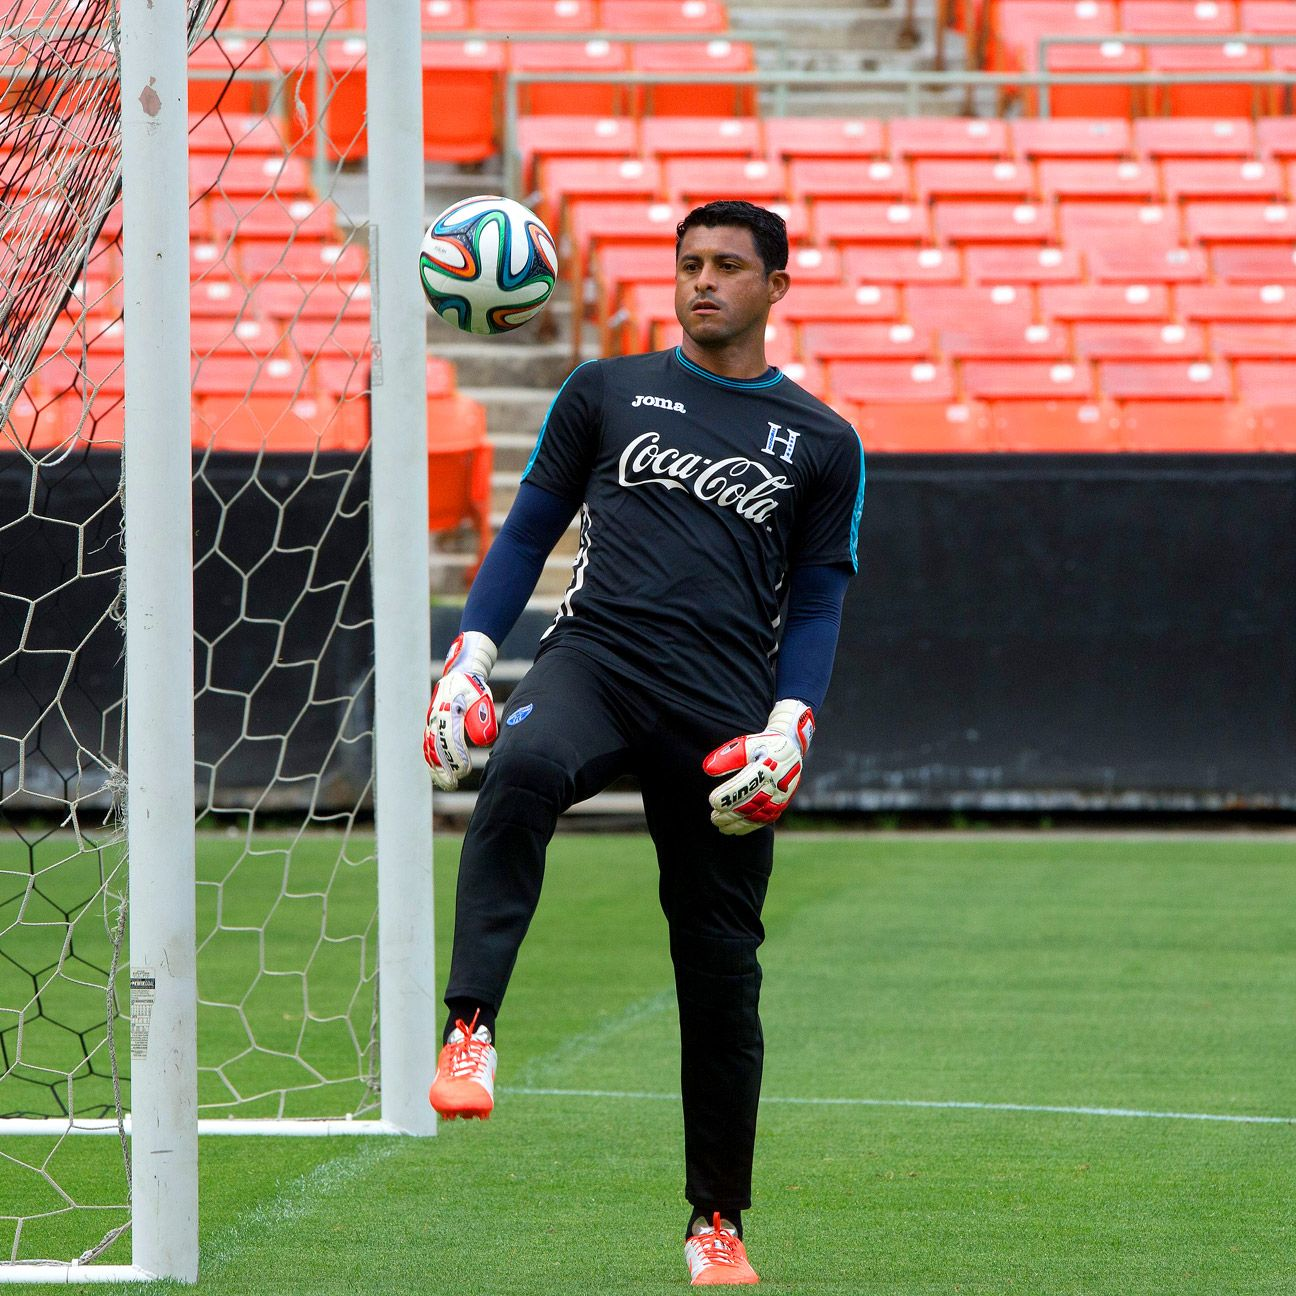 Despite failing to start for his club team, Noel Valladares remains a vital cog for Honduras.